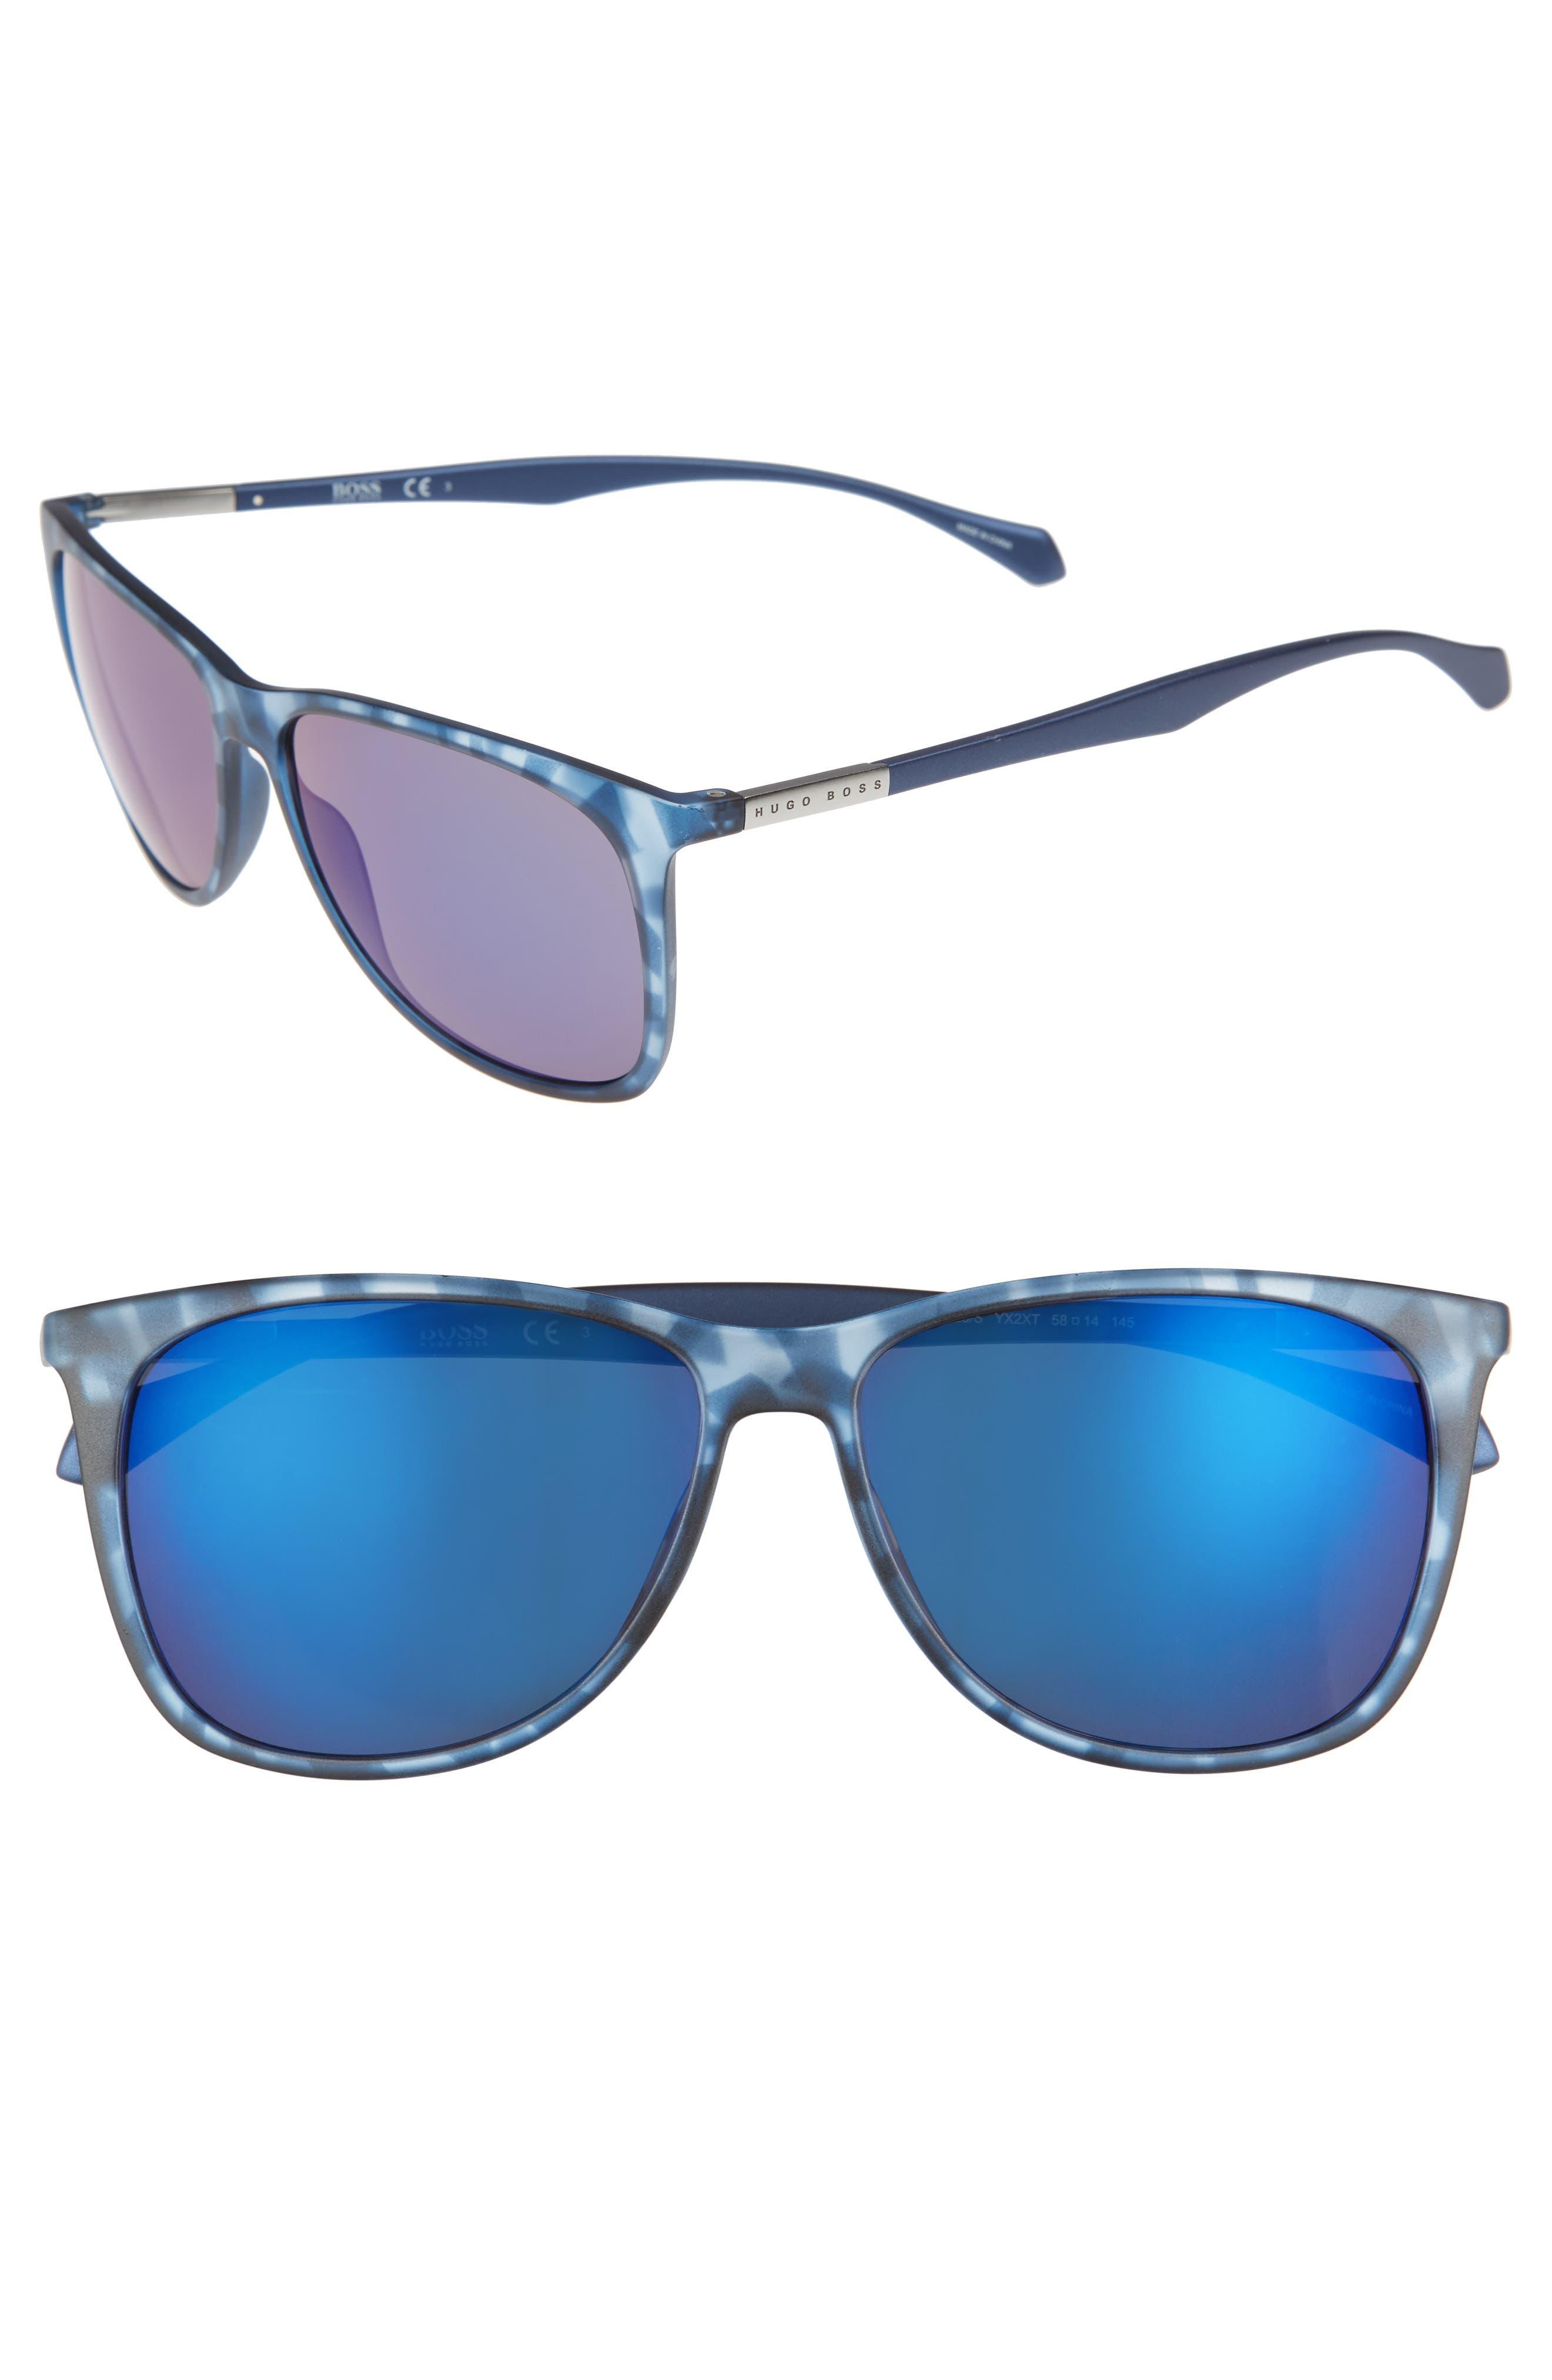 58mm Sunglasses,                         Main,                         color, Blue Havana/ Blue Sky